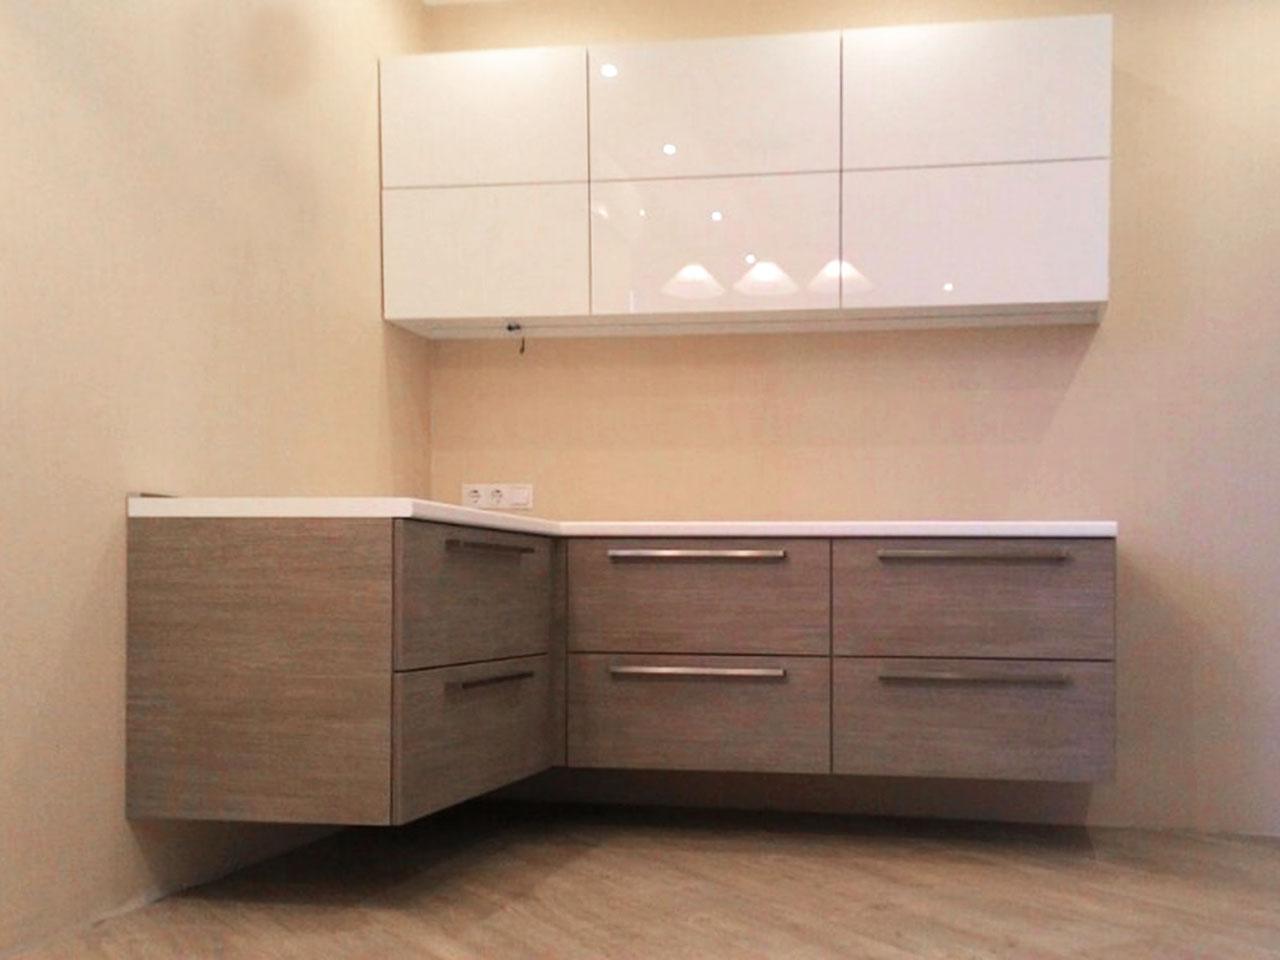 Фото. Встроенная кухня на заказ. Цена 130 тыс. рублей